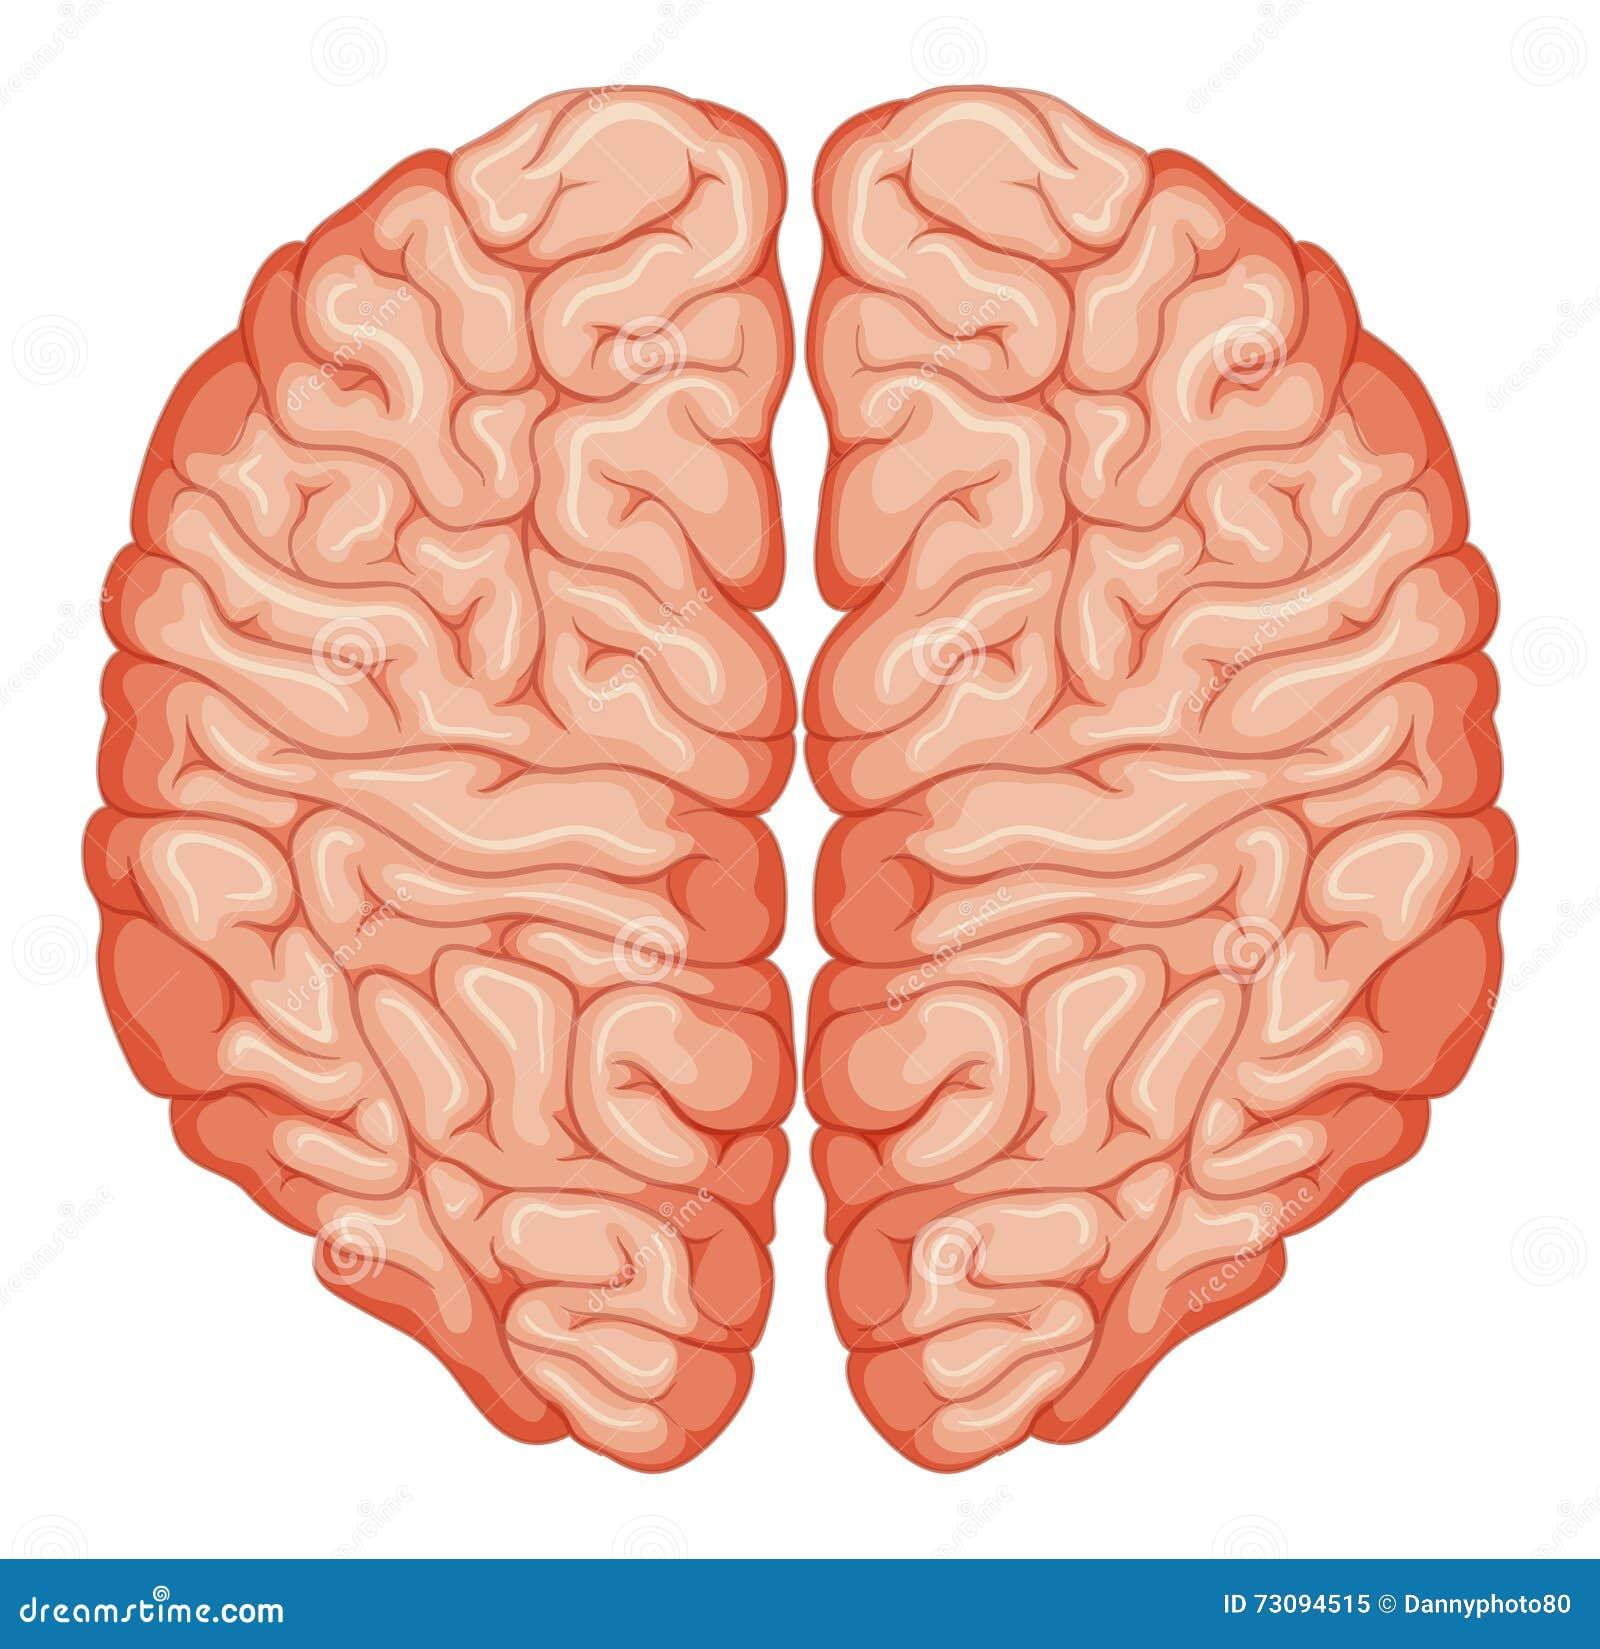 brain top view vector - photo #15